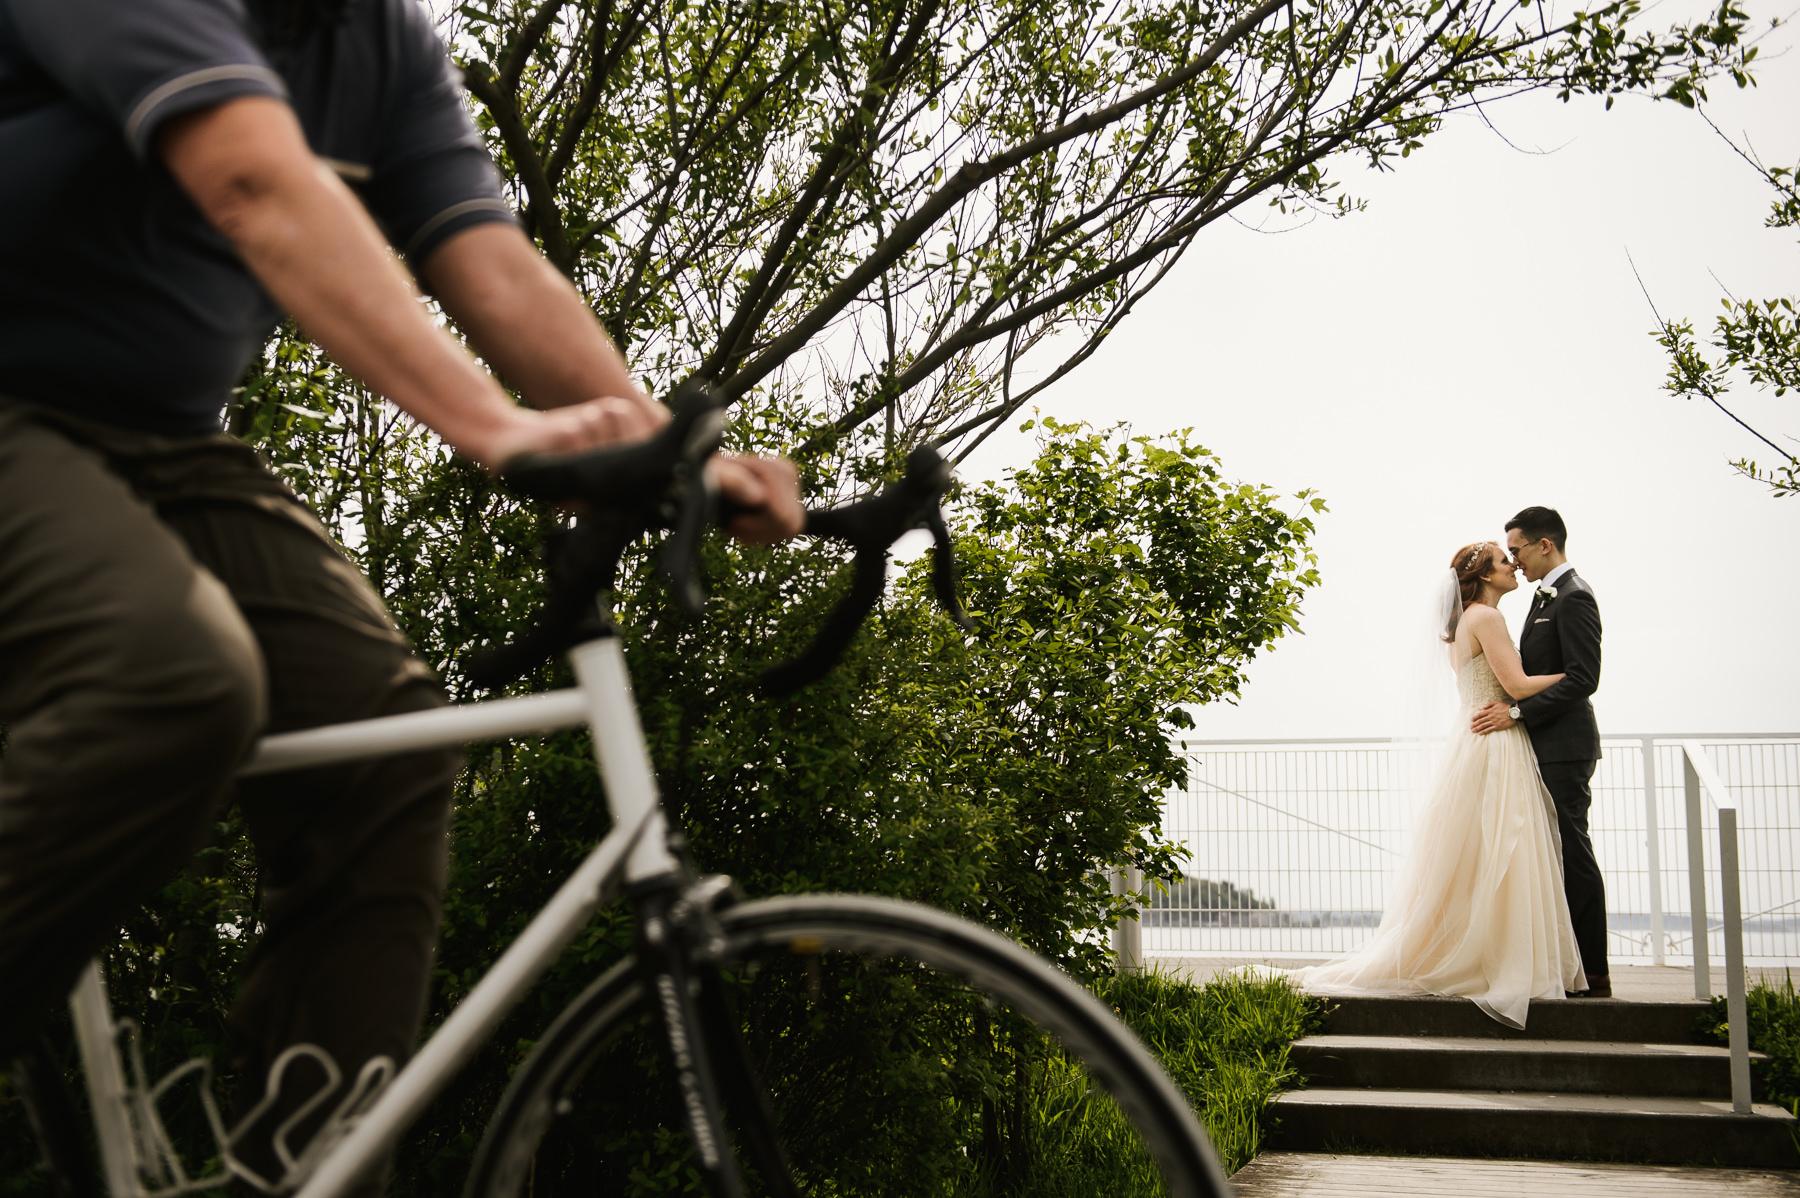 creative bike pedestrian wedding portrait